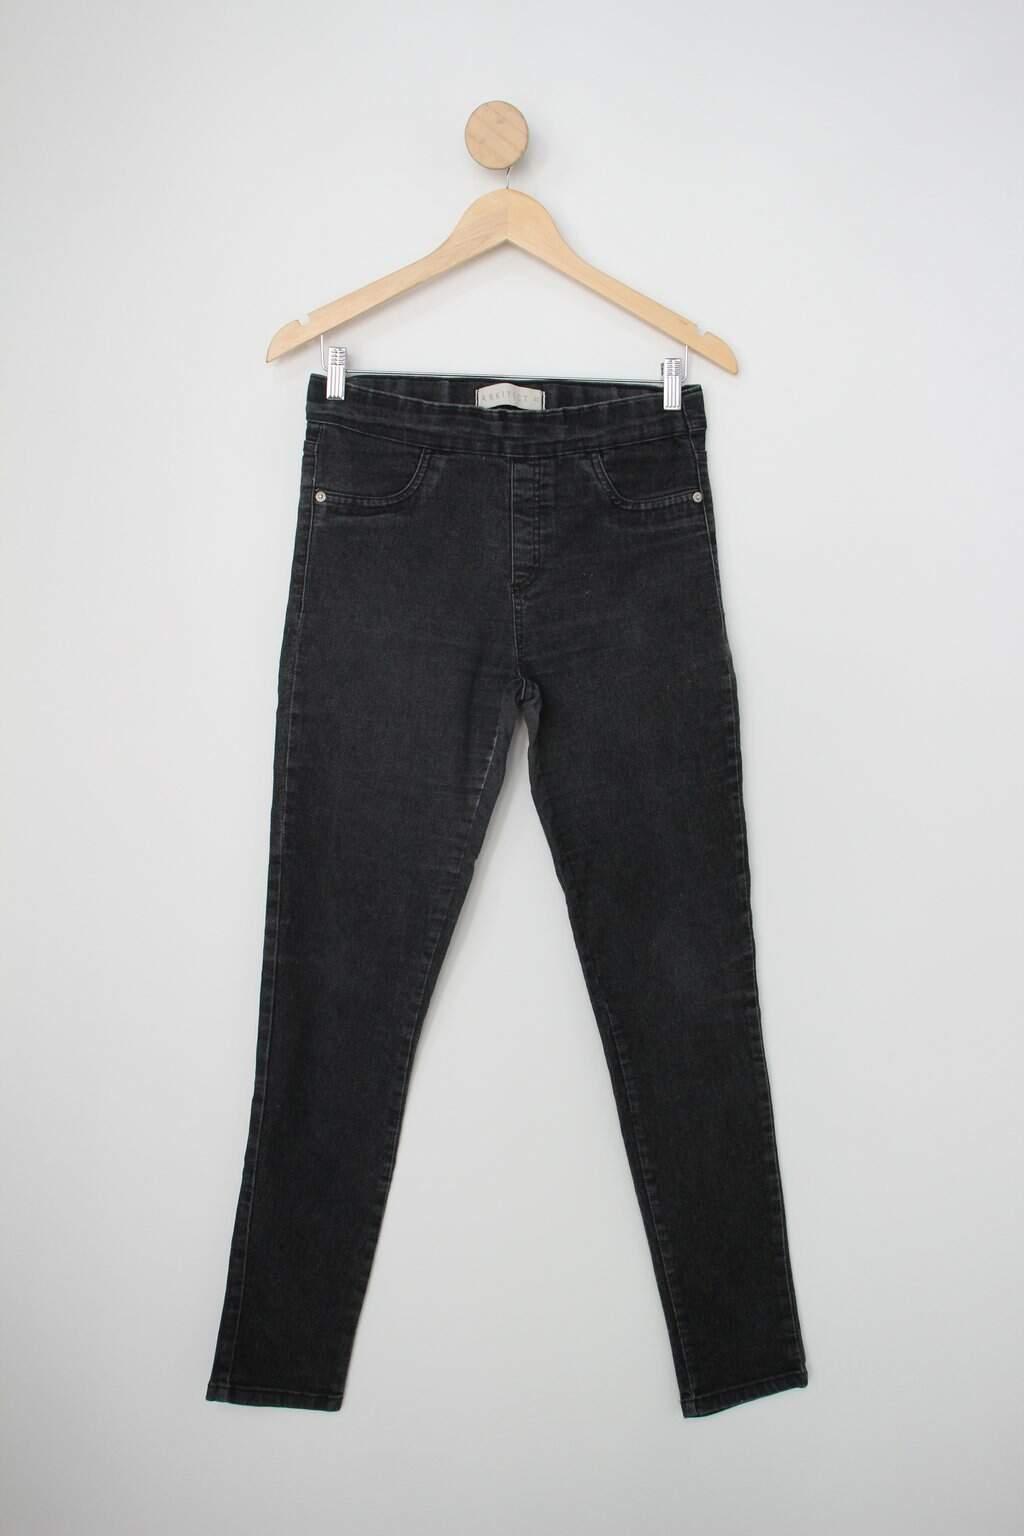 Calça Jeans Arkitect Feminina Preta